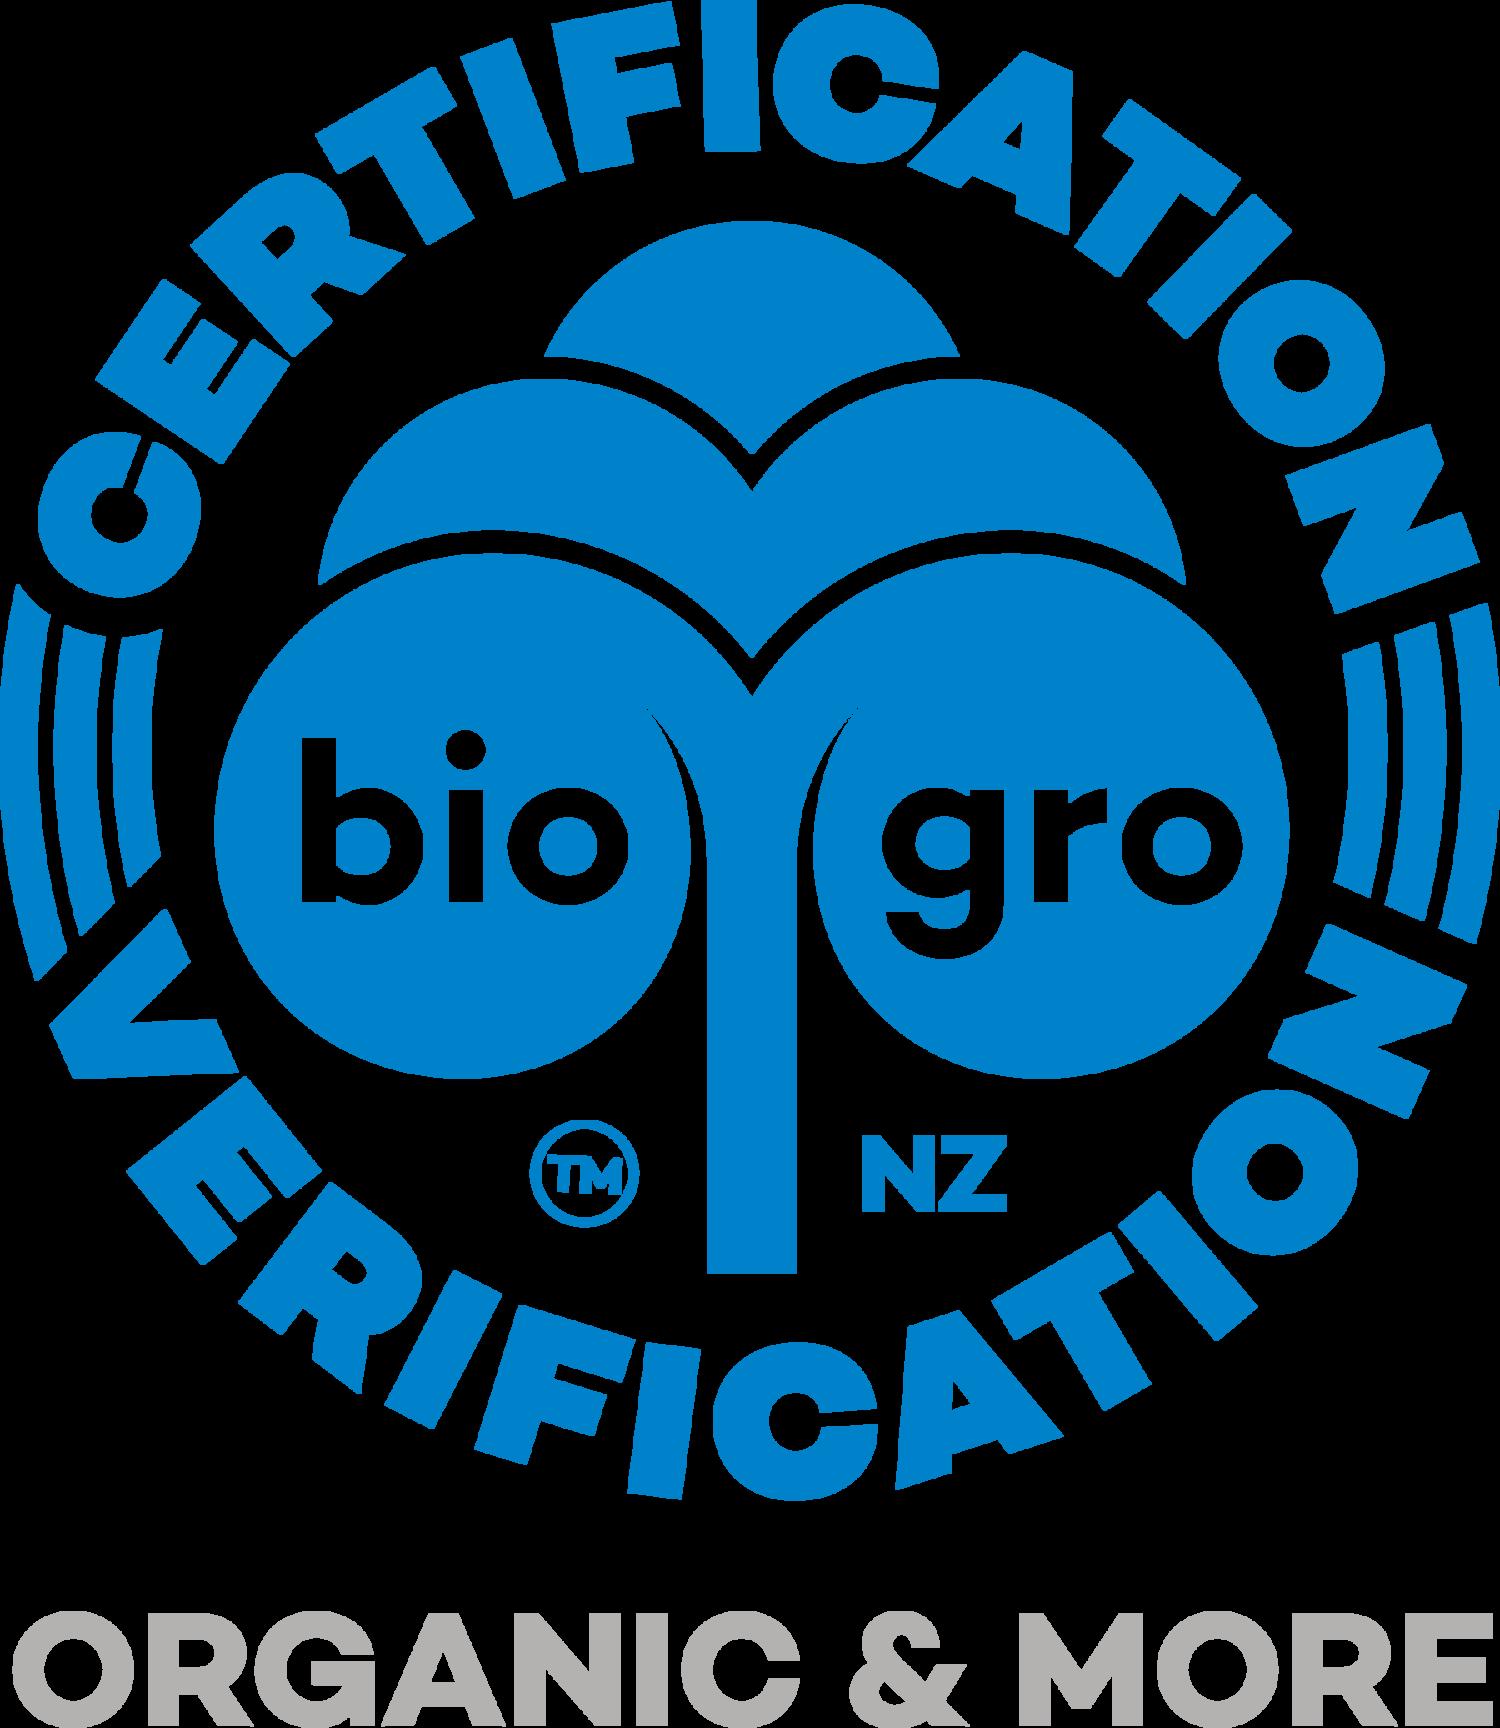 Non gmo certification biogro nz biogro nz buycottarizona Images